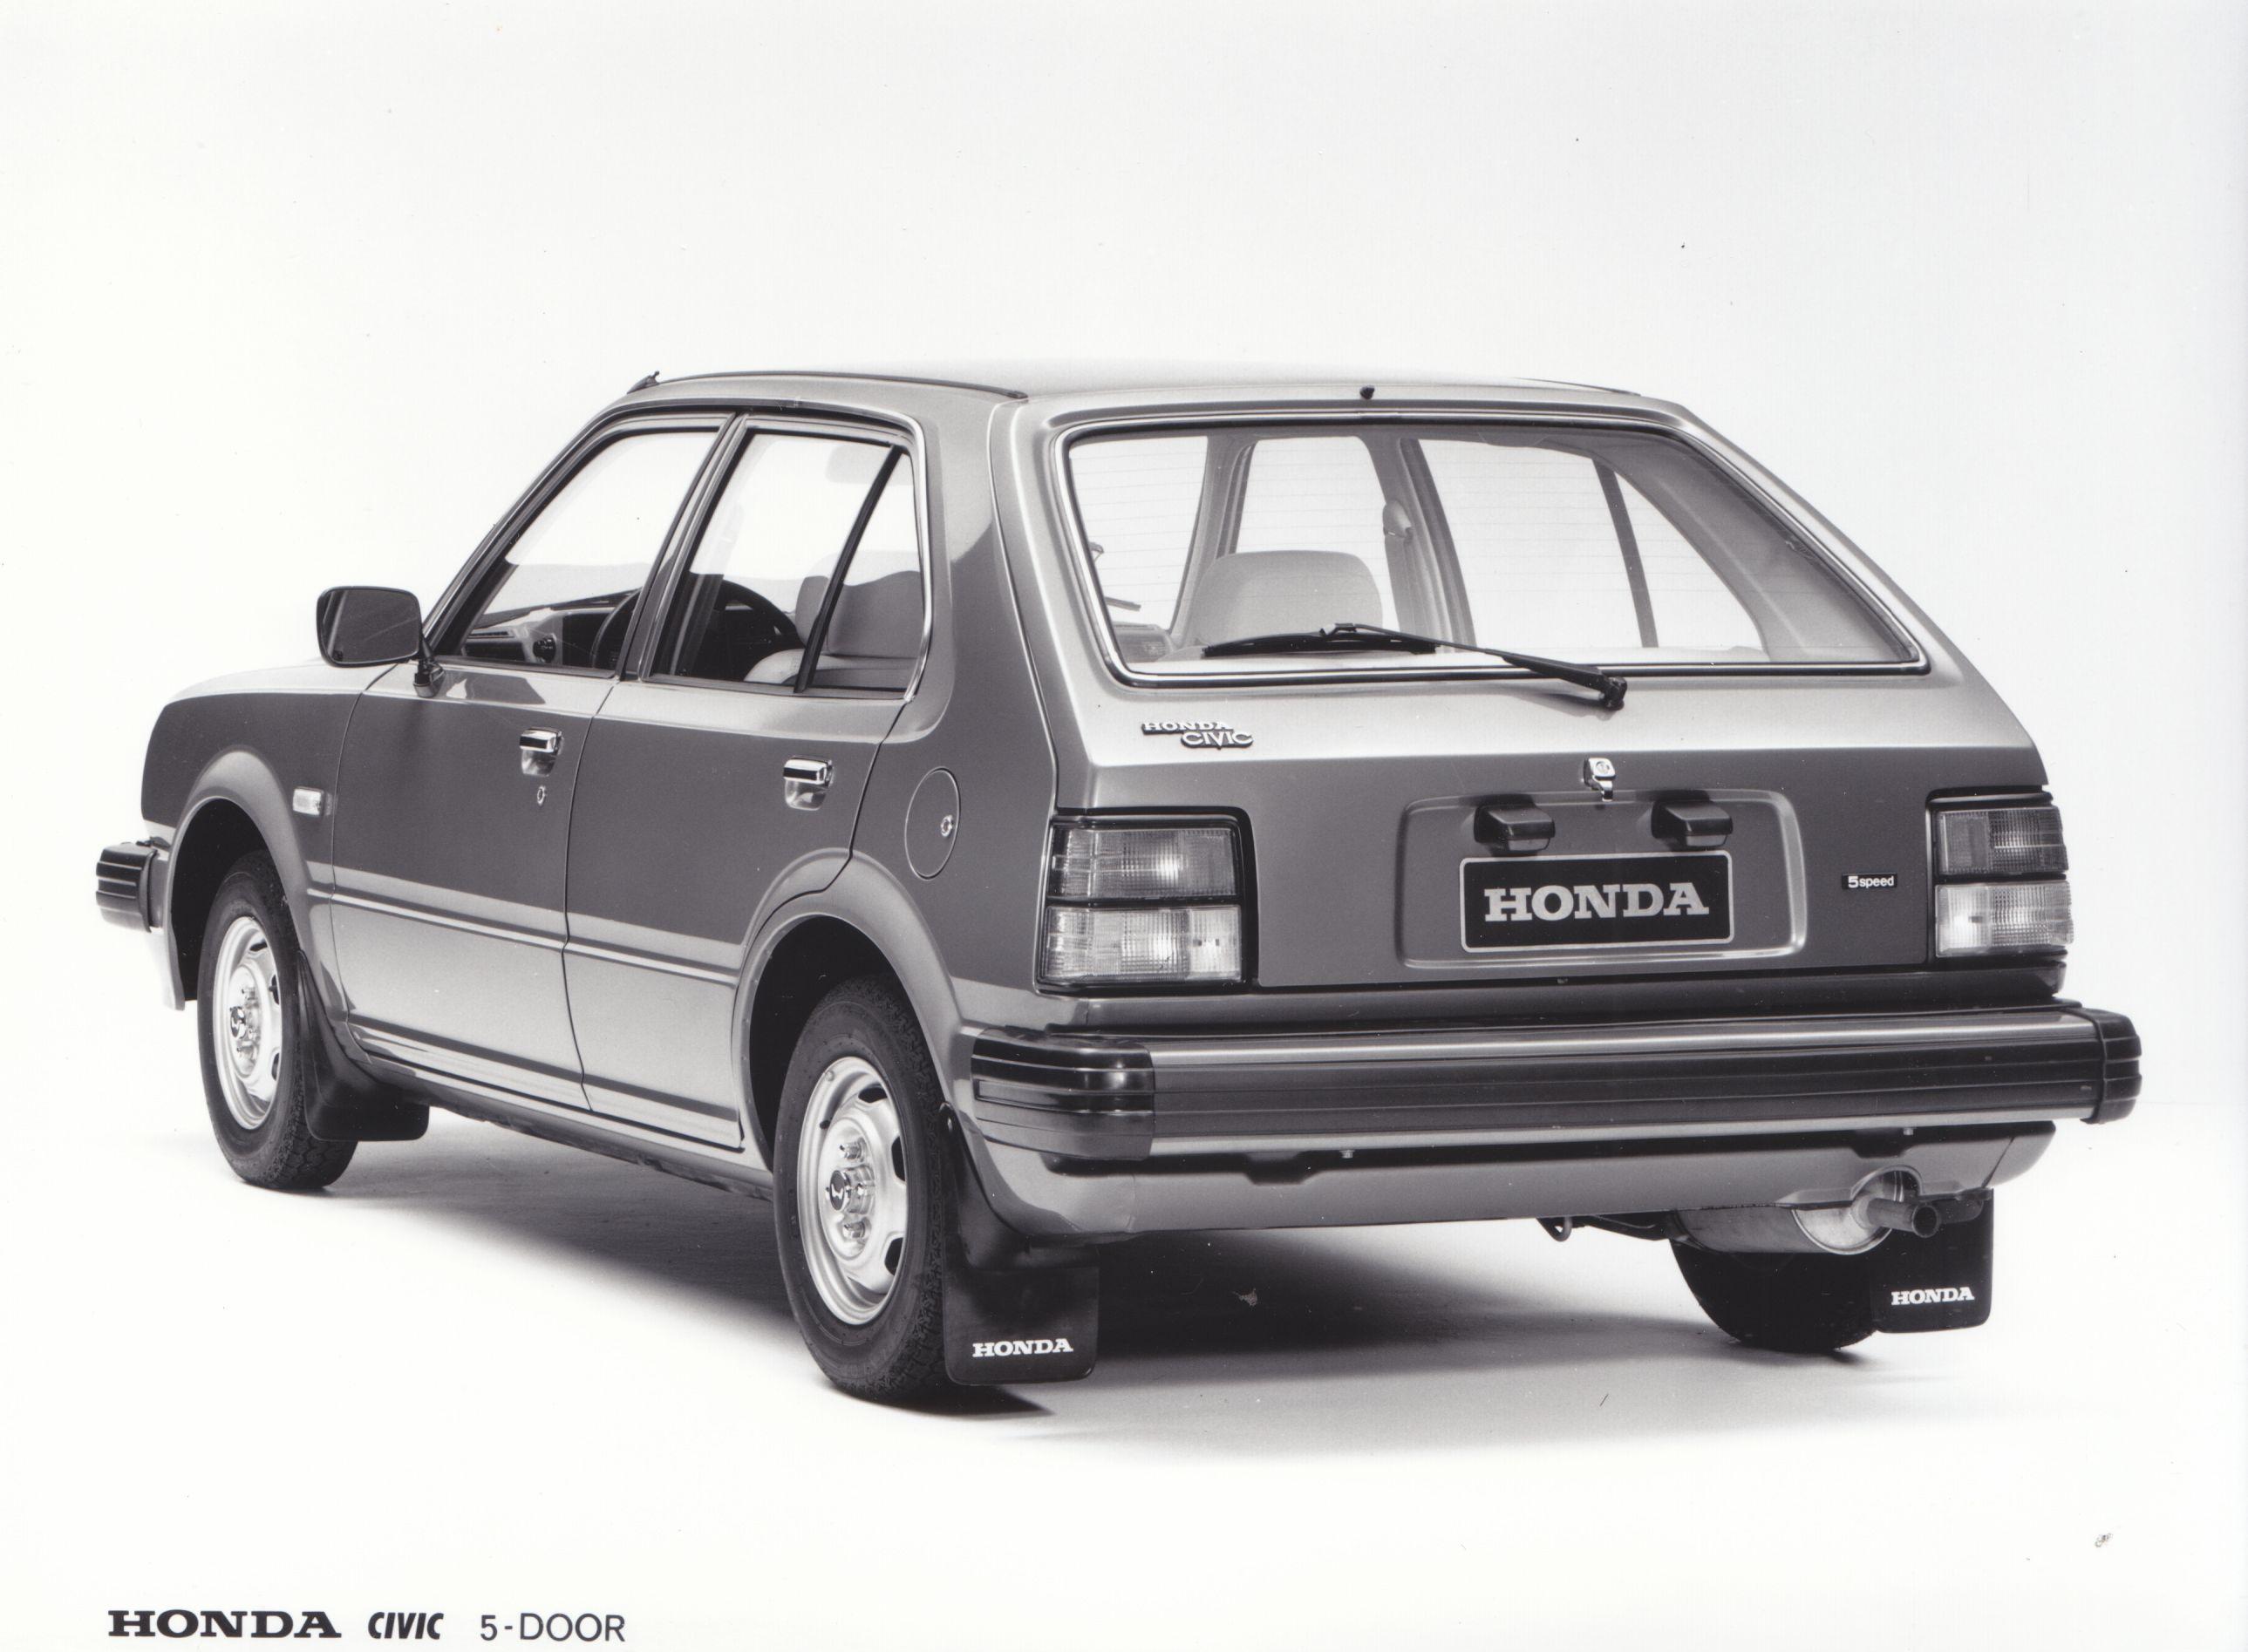 Honda Civic generation II 5-door (Japanese factory issued press photo, 1980)